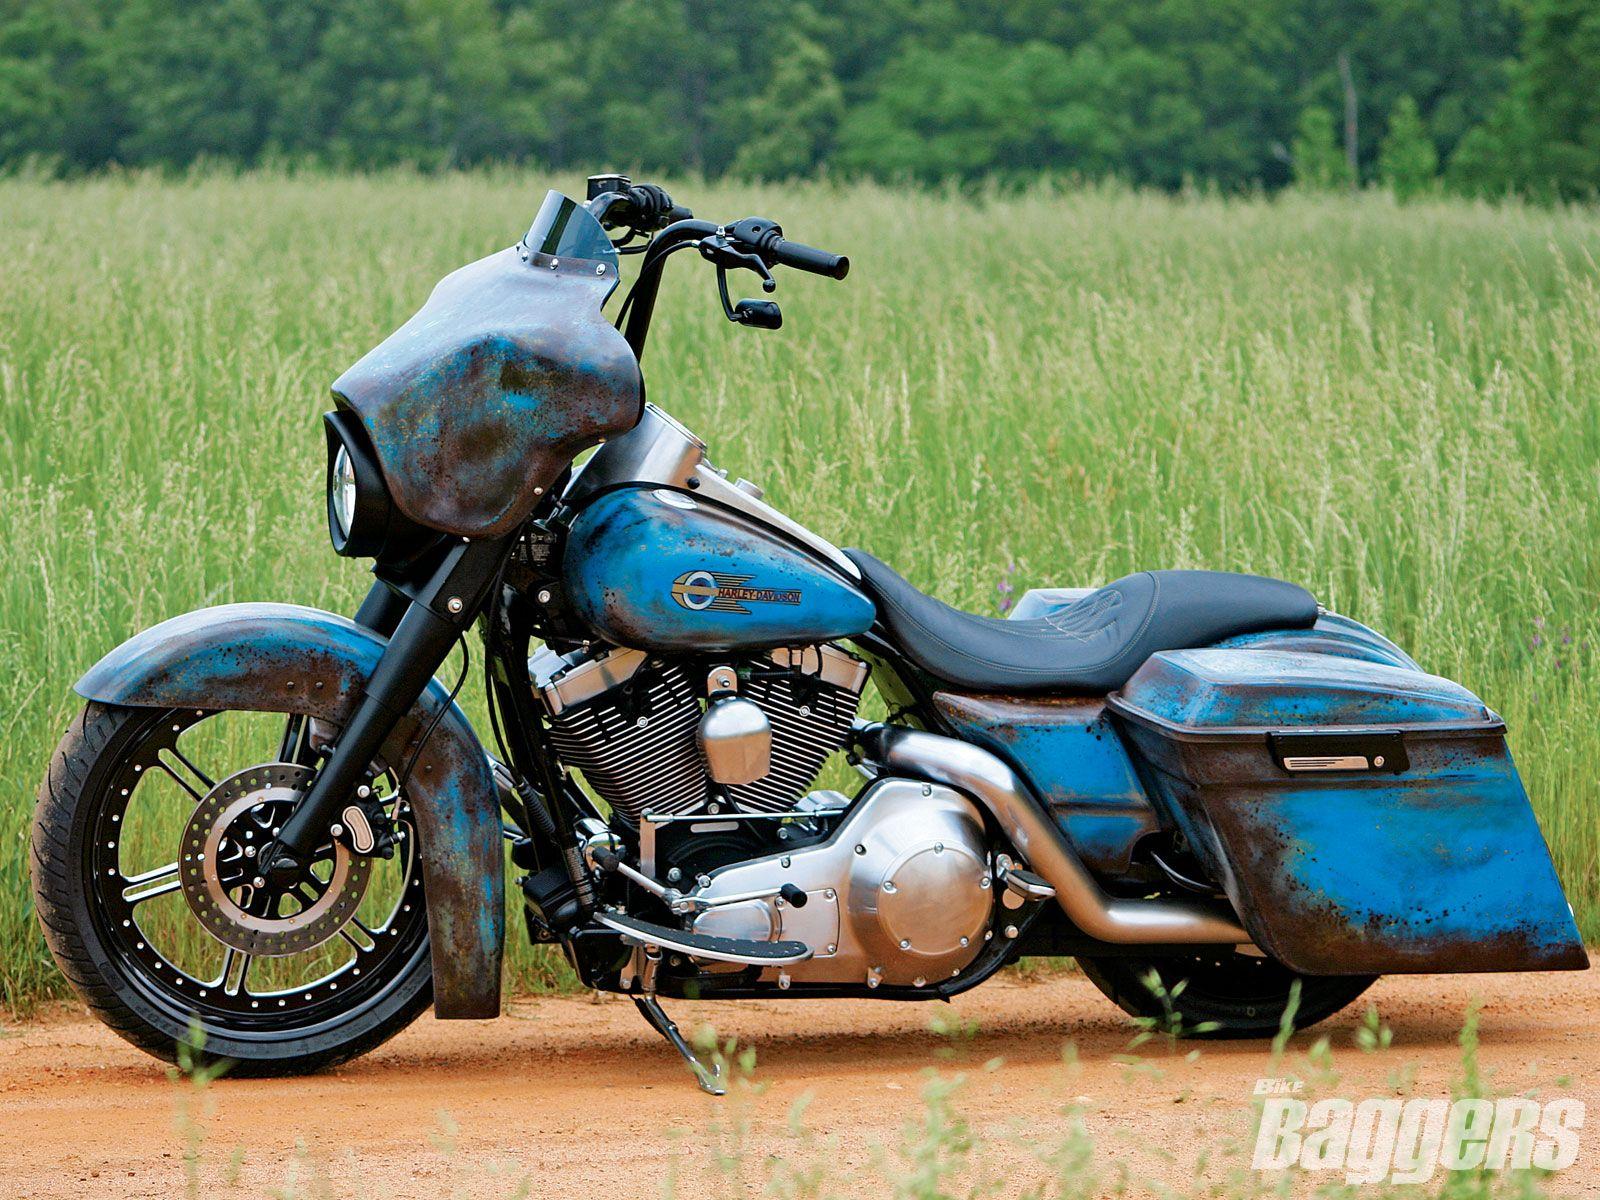 Harley Davidson: 2005 Harley Davidson Road King Custom Left View